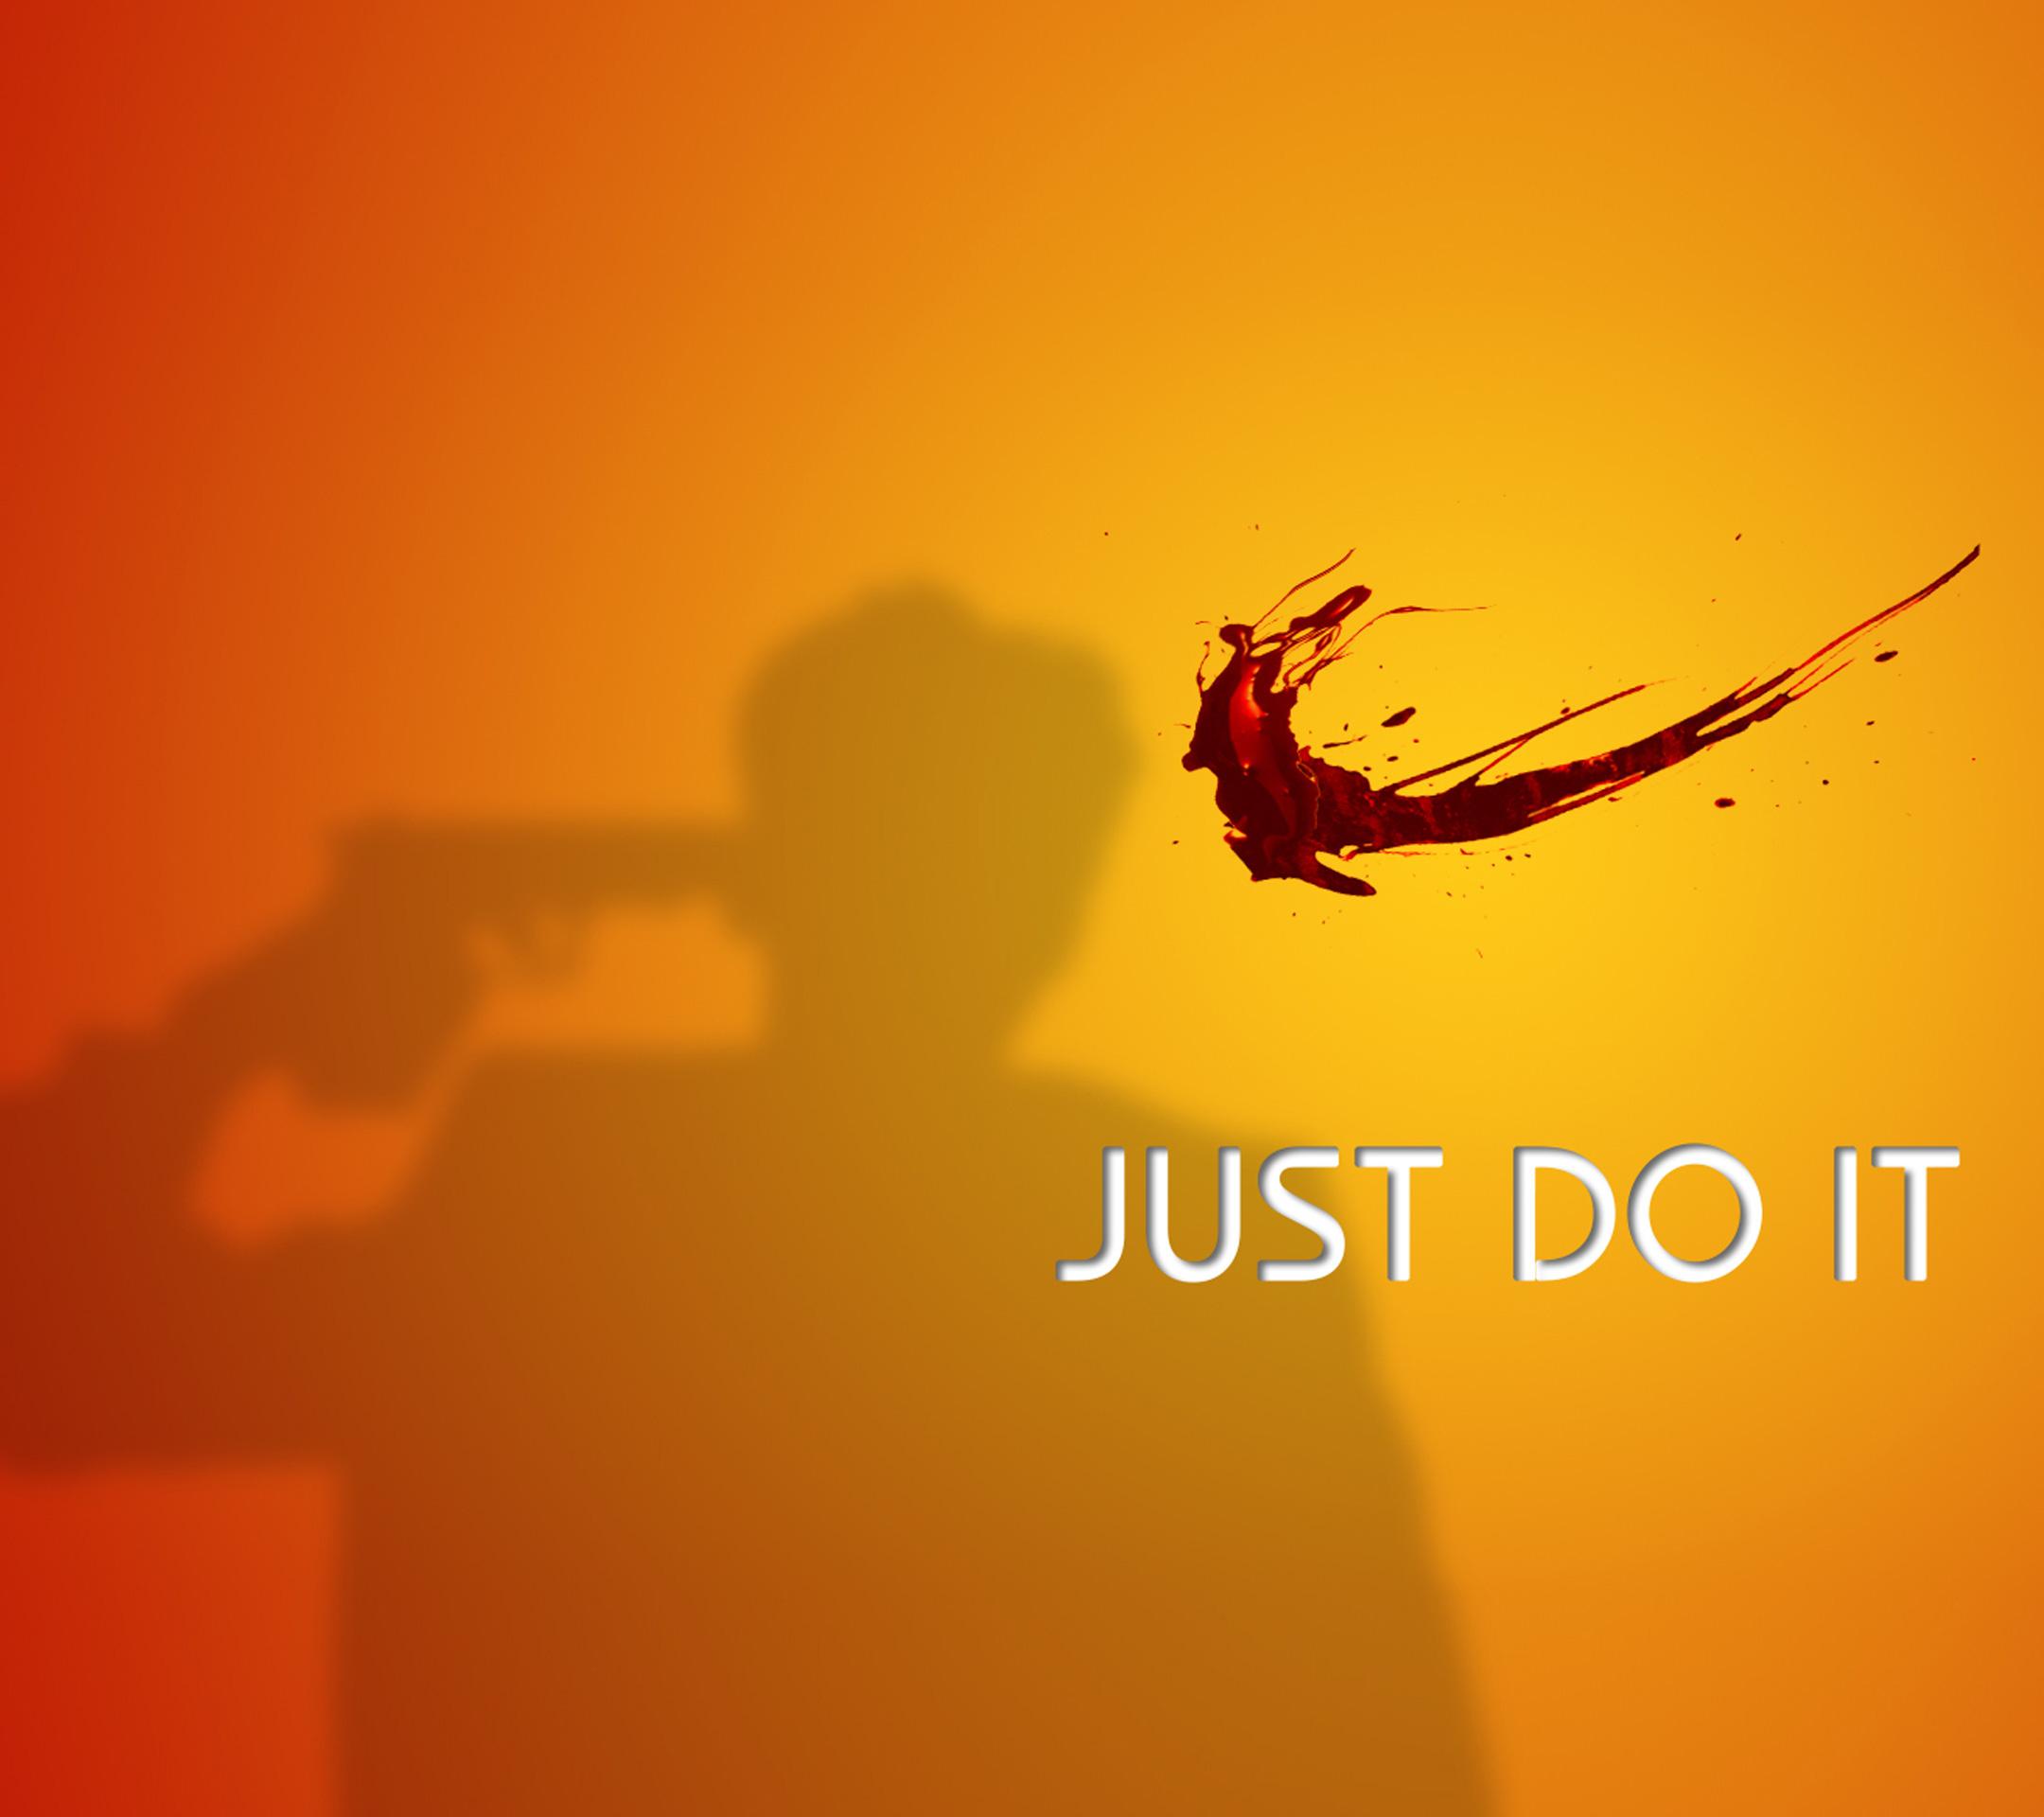 Just do it wallpaper 10553940